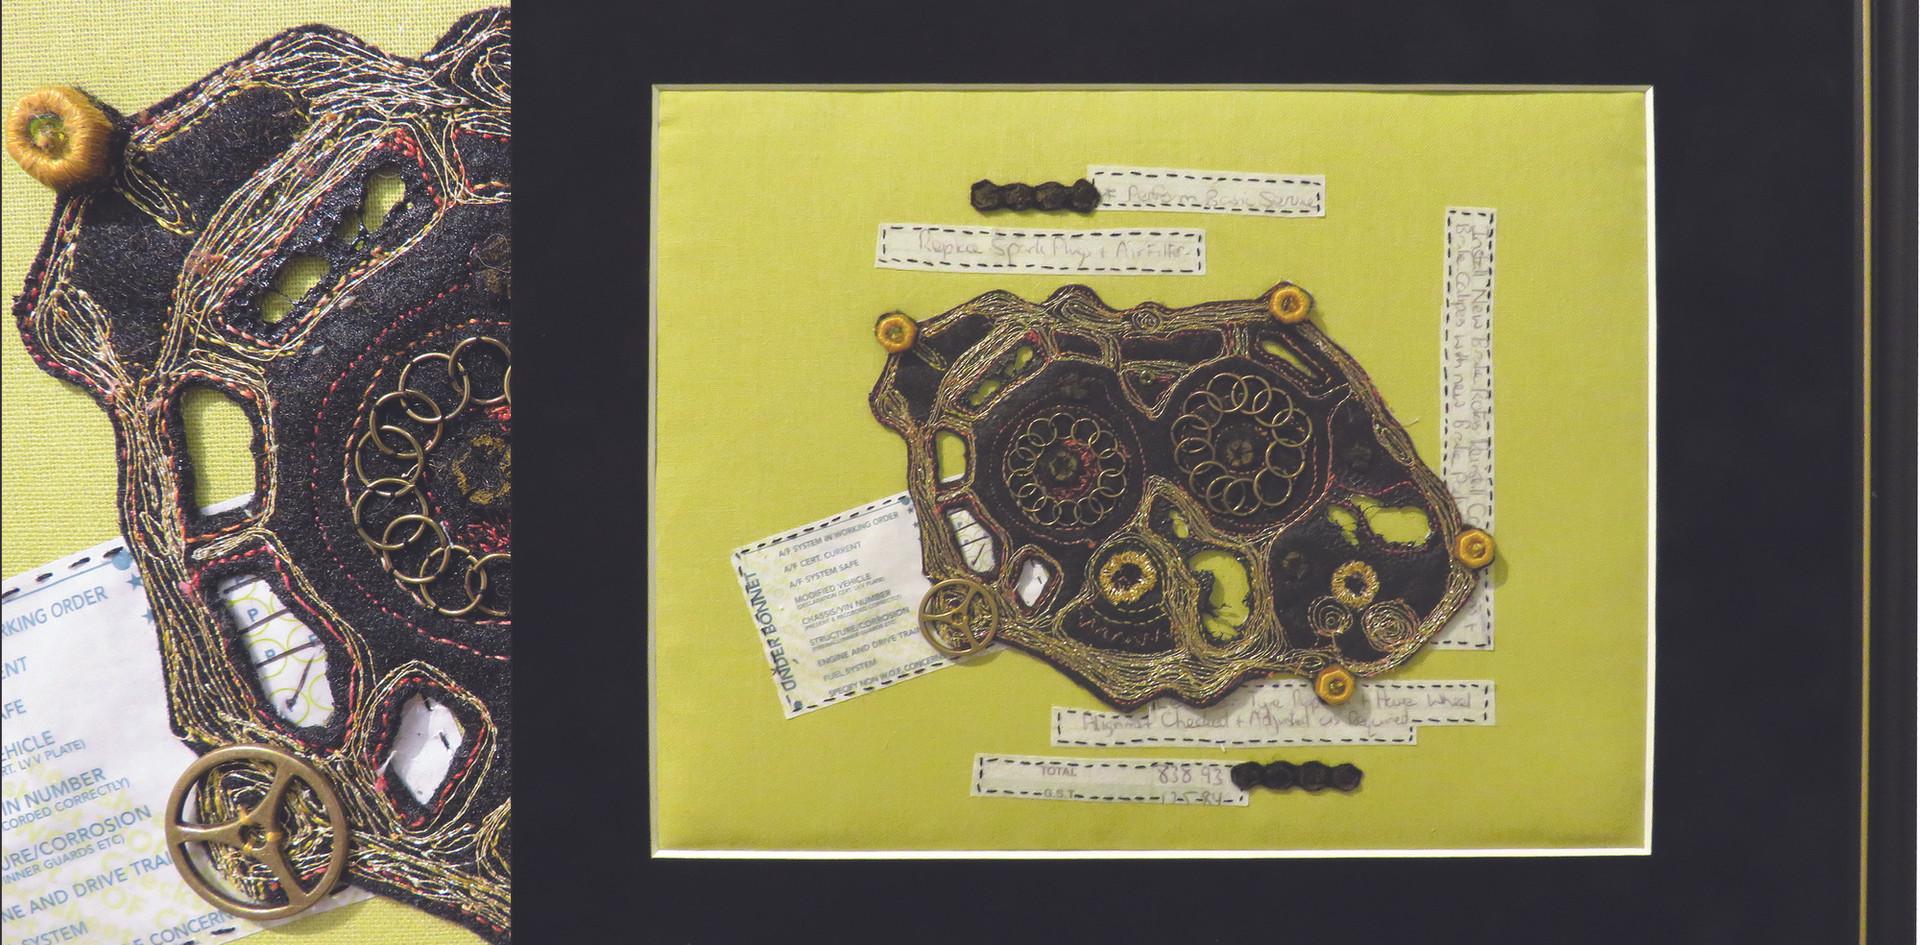 MERIT: ©GETTING AROUND (IN MY HONDA) by Donna Kennedy, Kapiti.